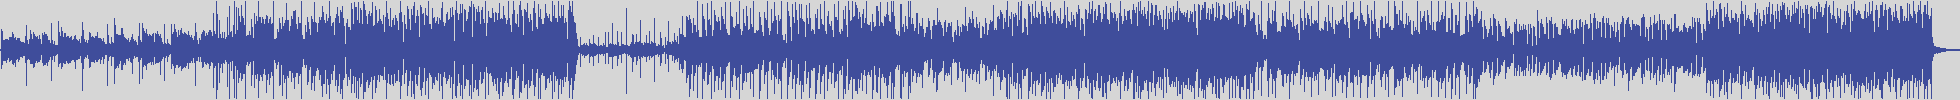 gold_hit_records [GHR005] Adele Crema - Close the Edge [Radio Edit] audio wave form